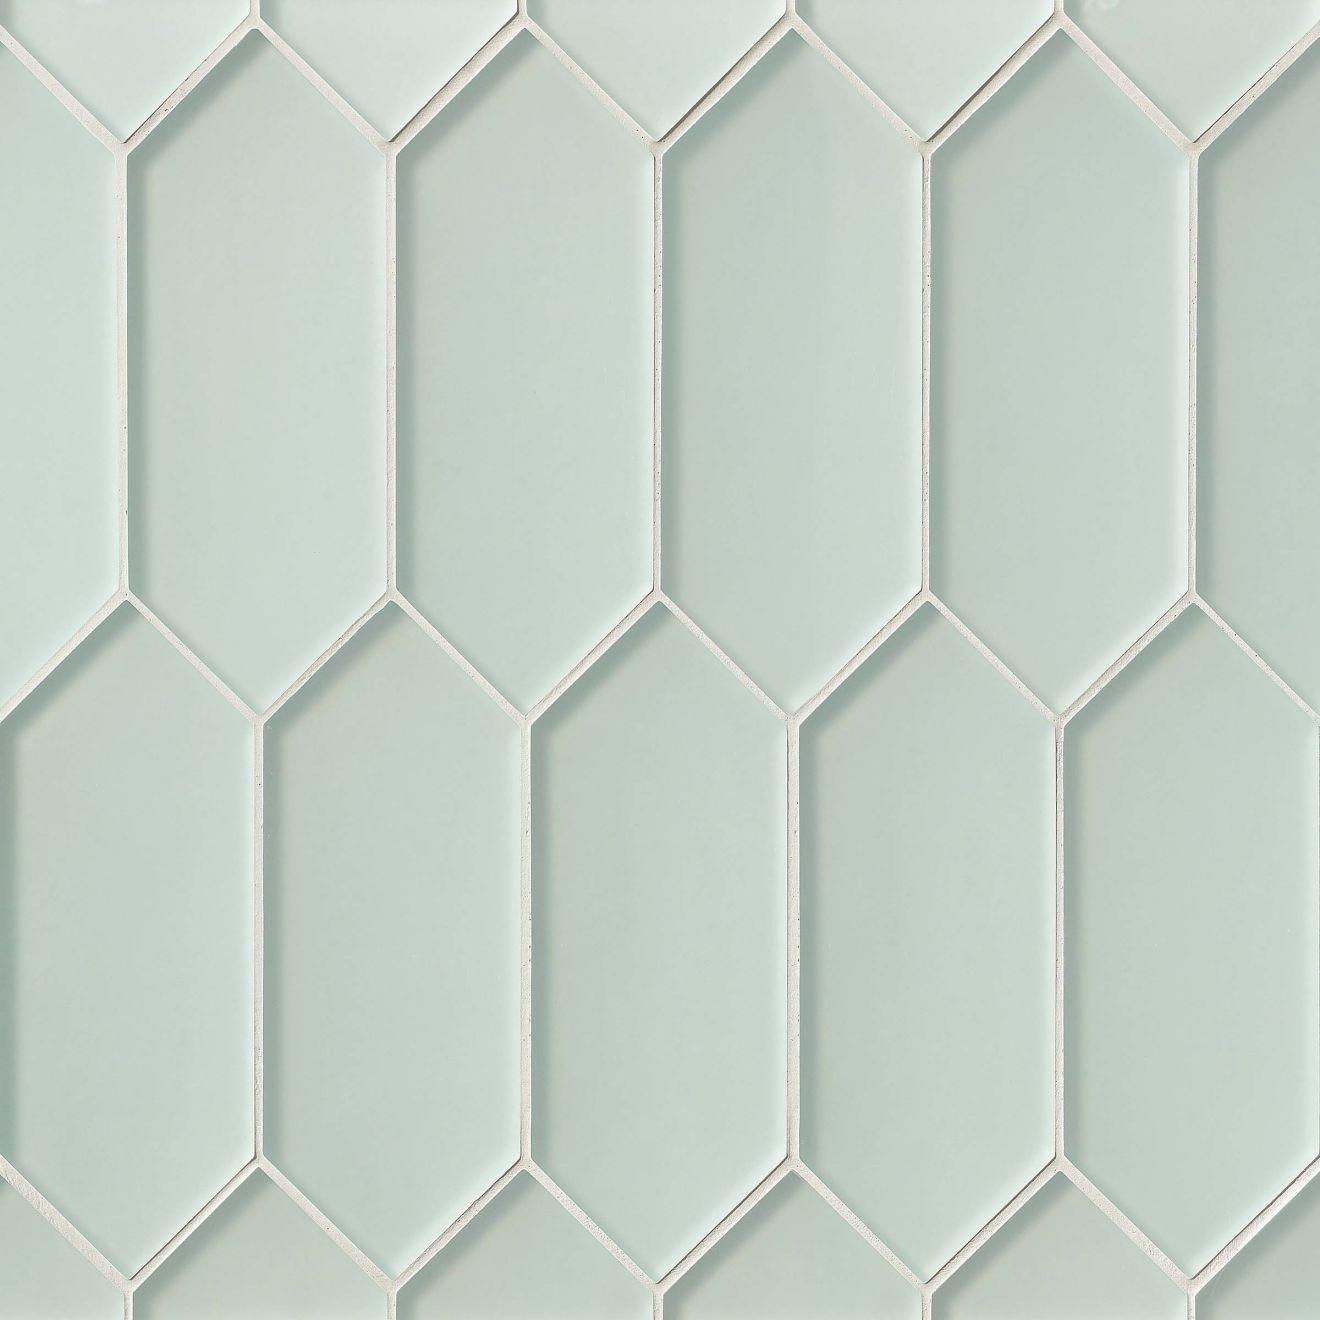 Verve Wall Mosaic in Ice Breaker